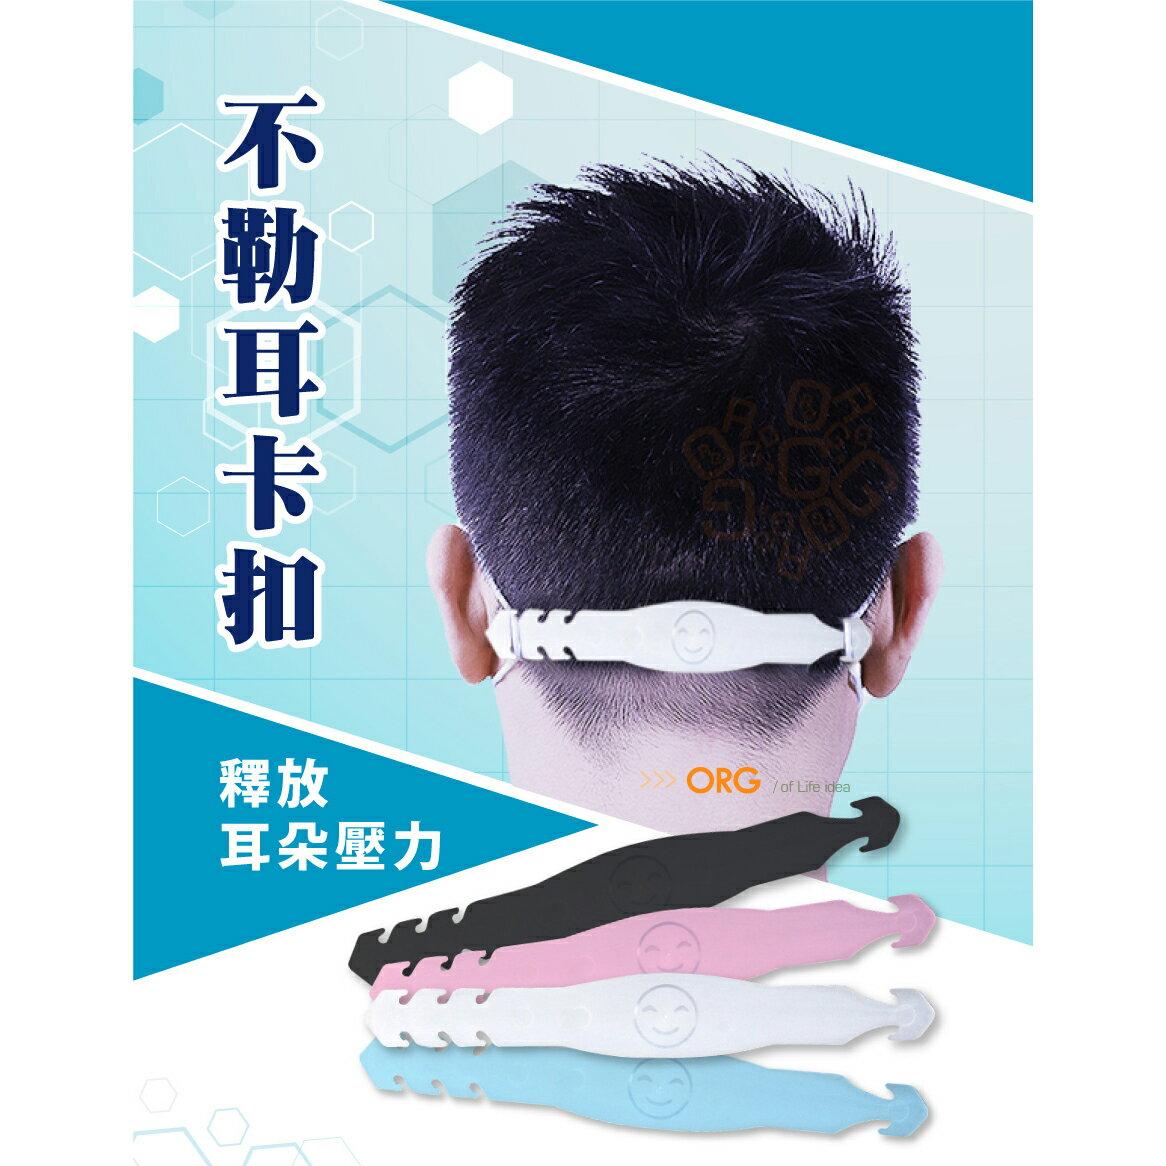 ORG《SD2446》第三件0元!3段調整 耳朵不痛 口罩延長扣 口罩延長器 口罩卡扣 口罩護耳神器 口罩神器 減壓